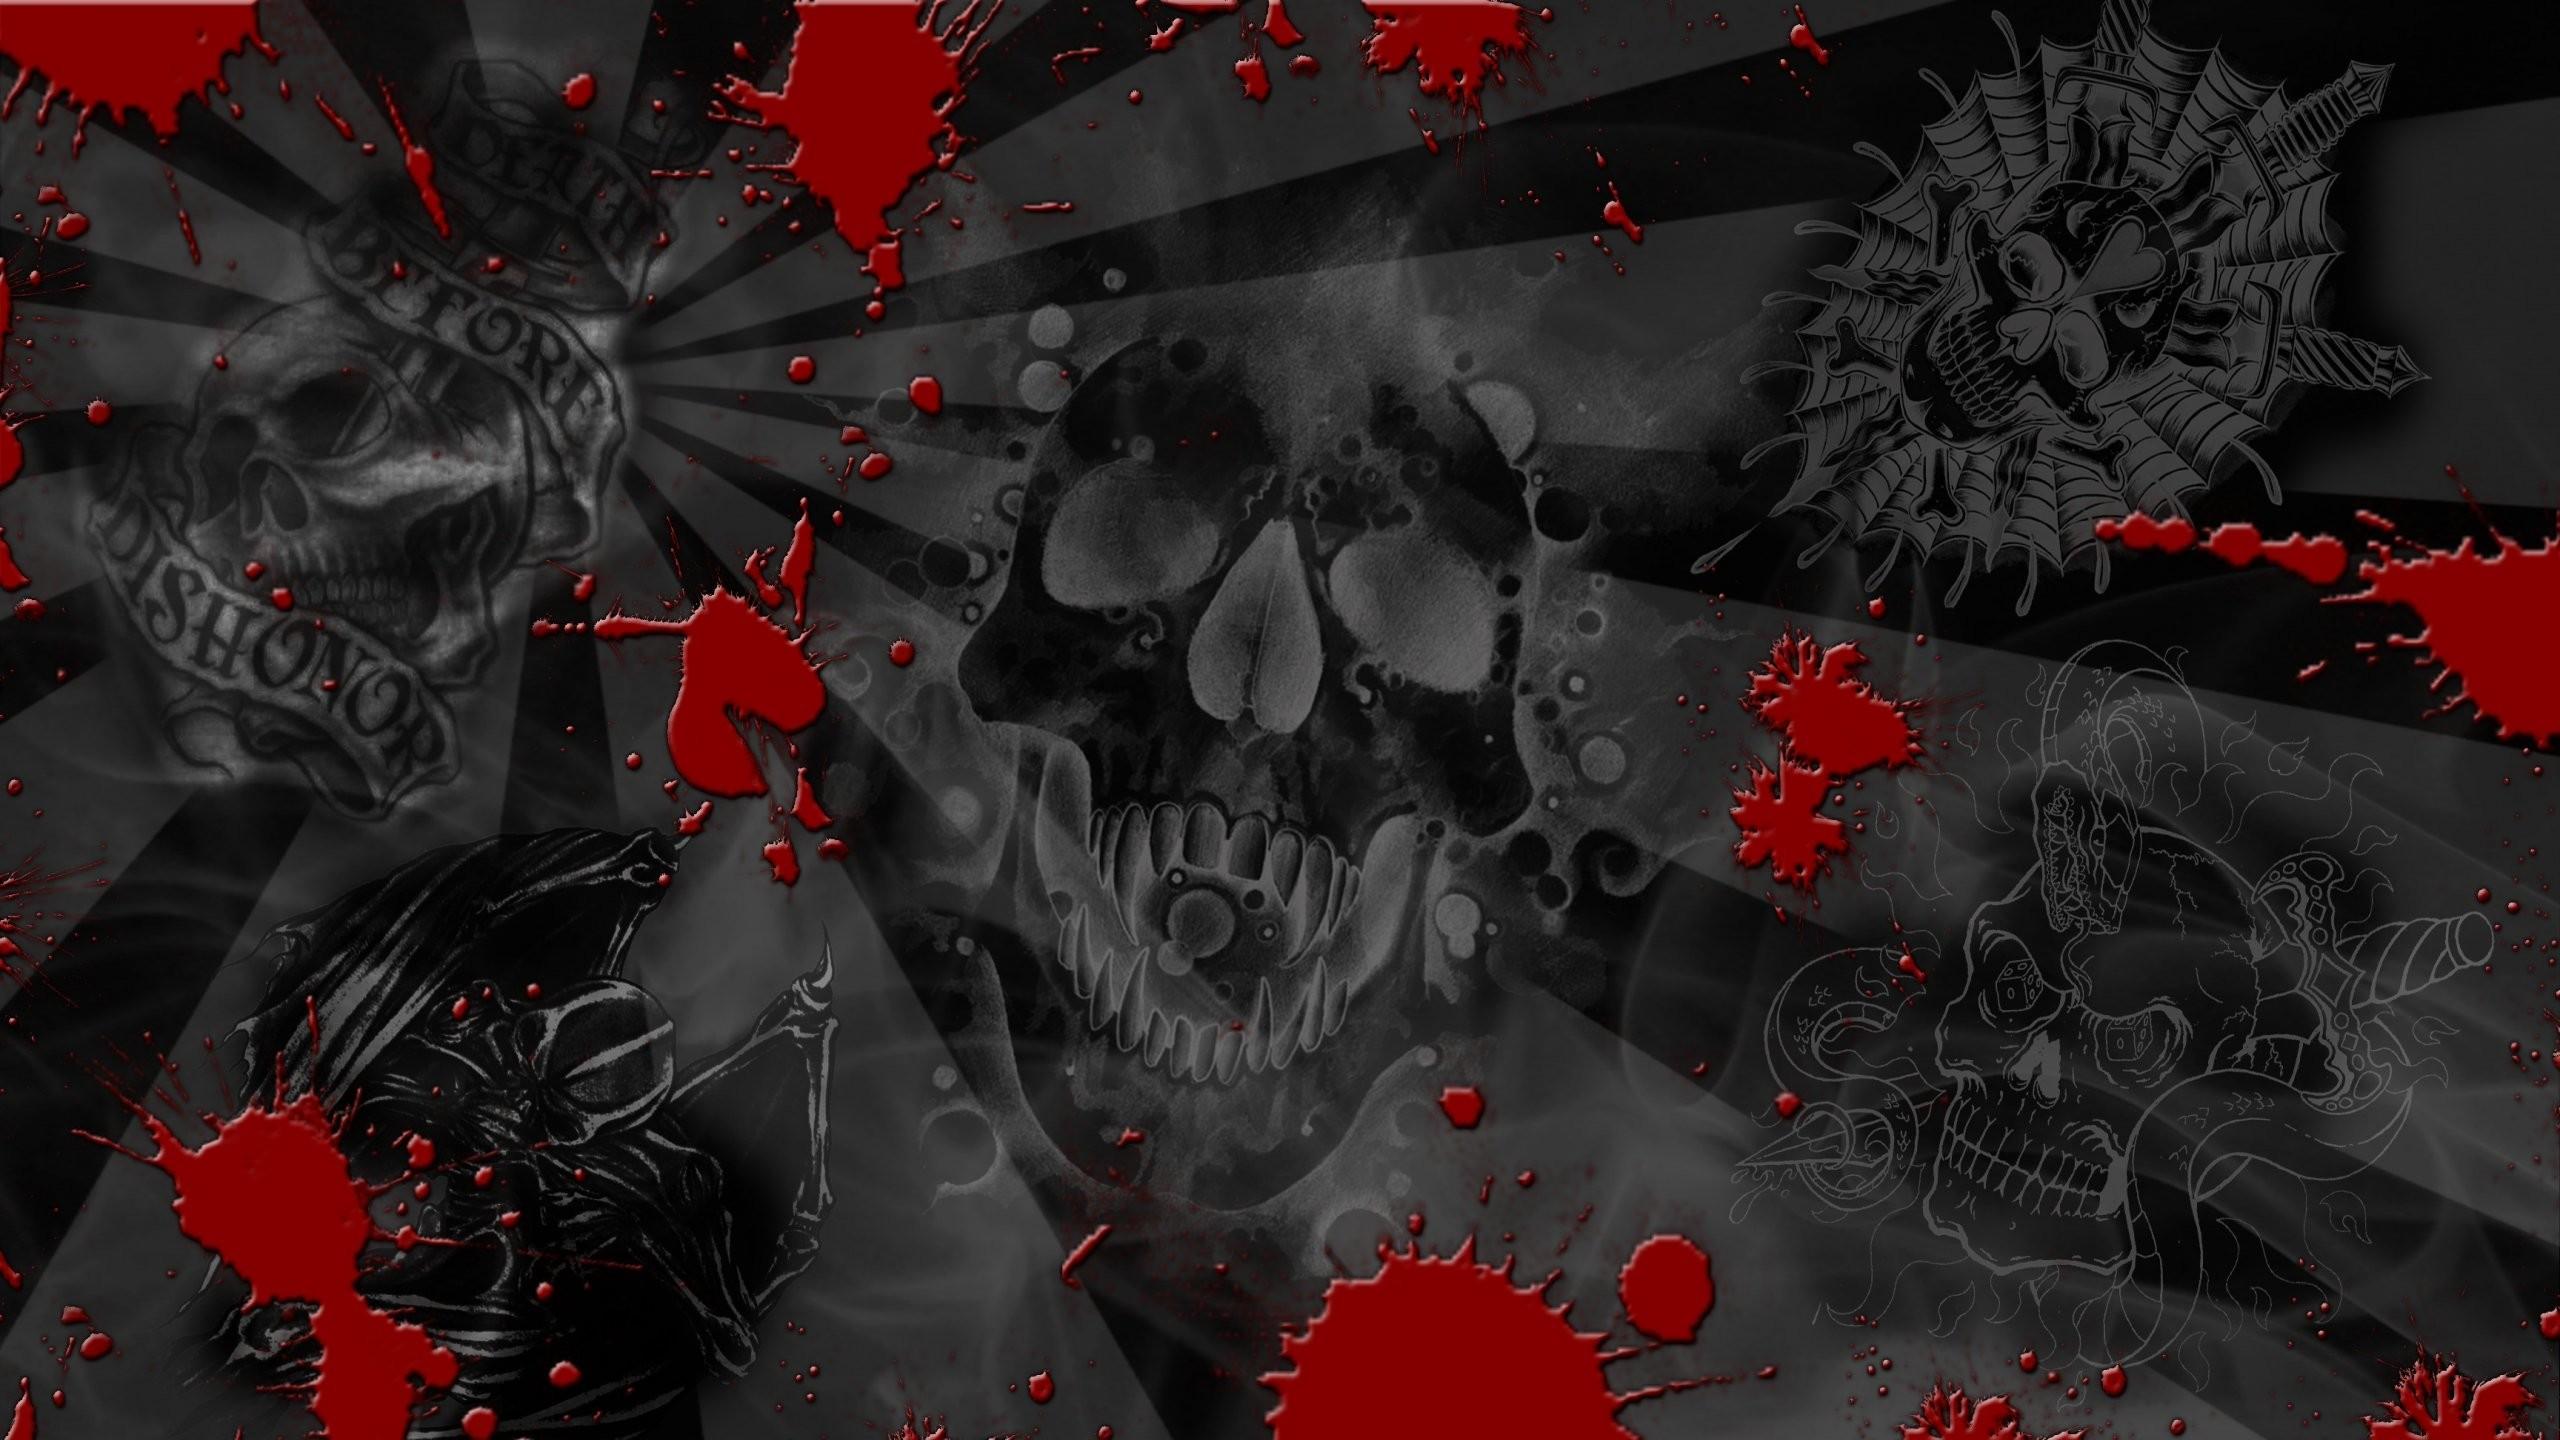 Res: 2560x1440, Skull Tattoo Wallpaper